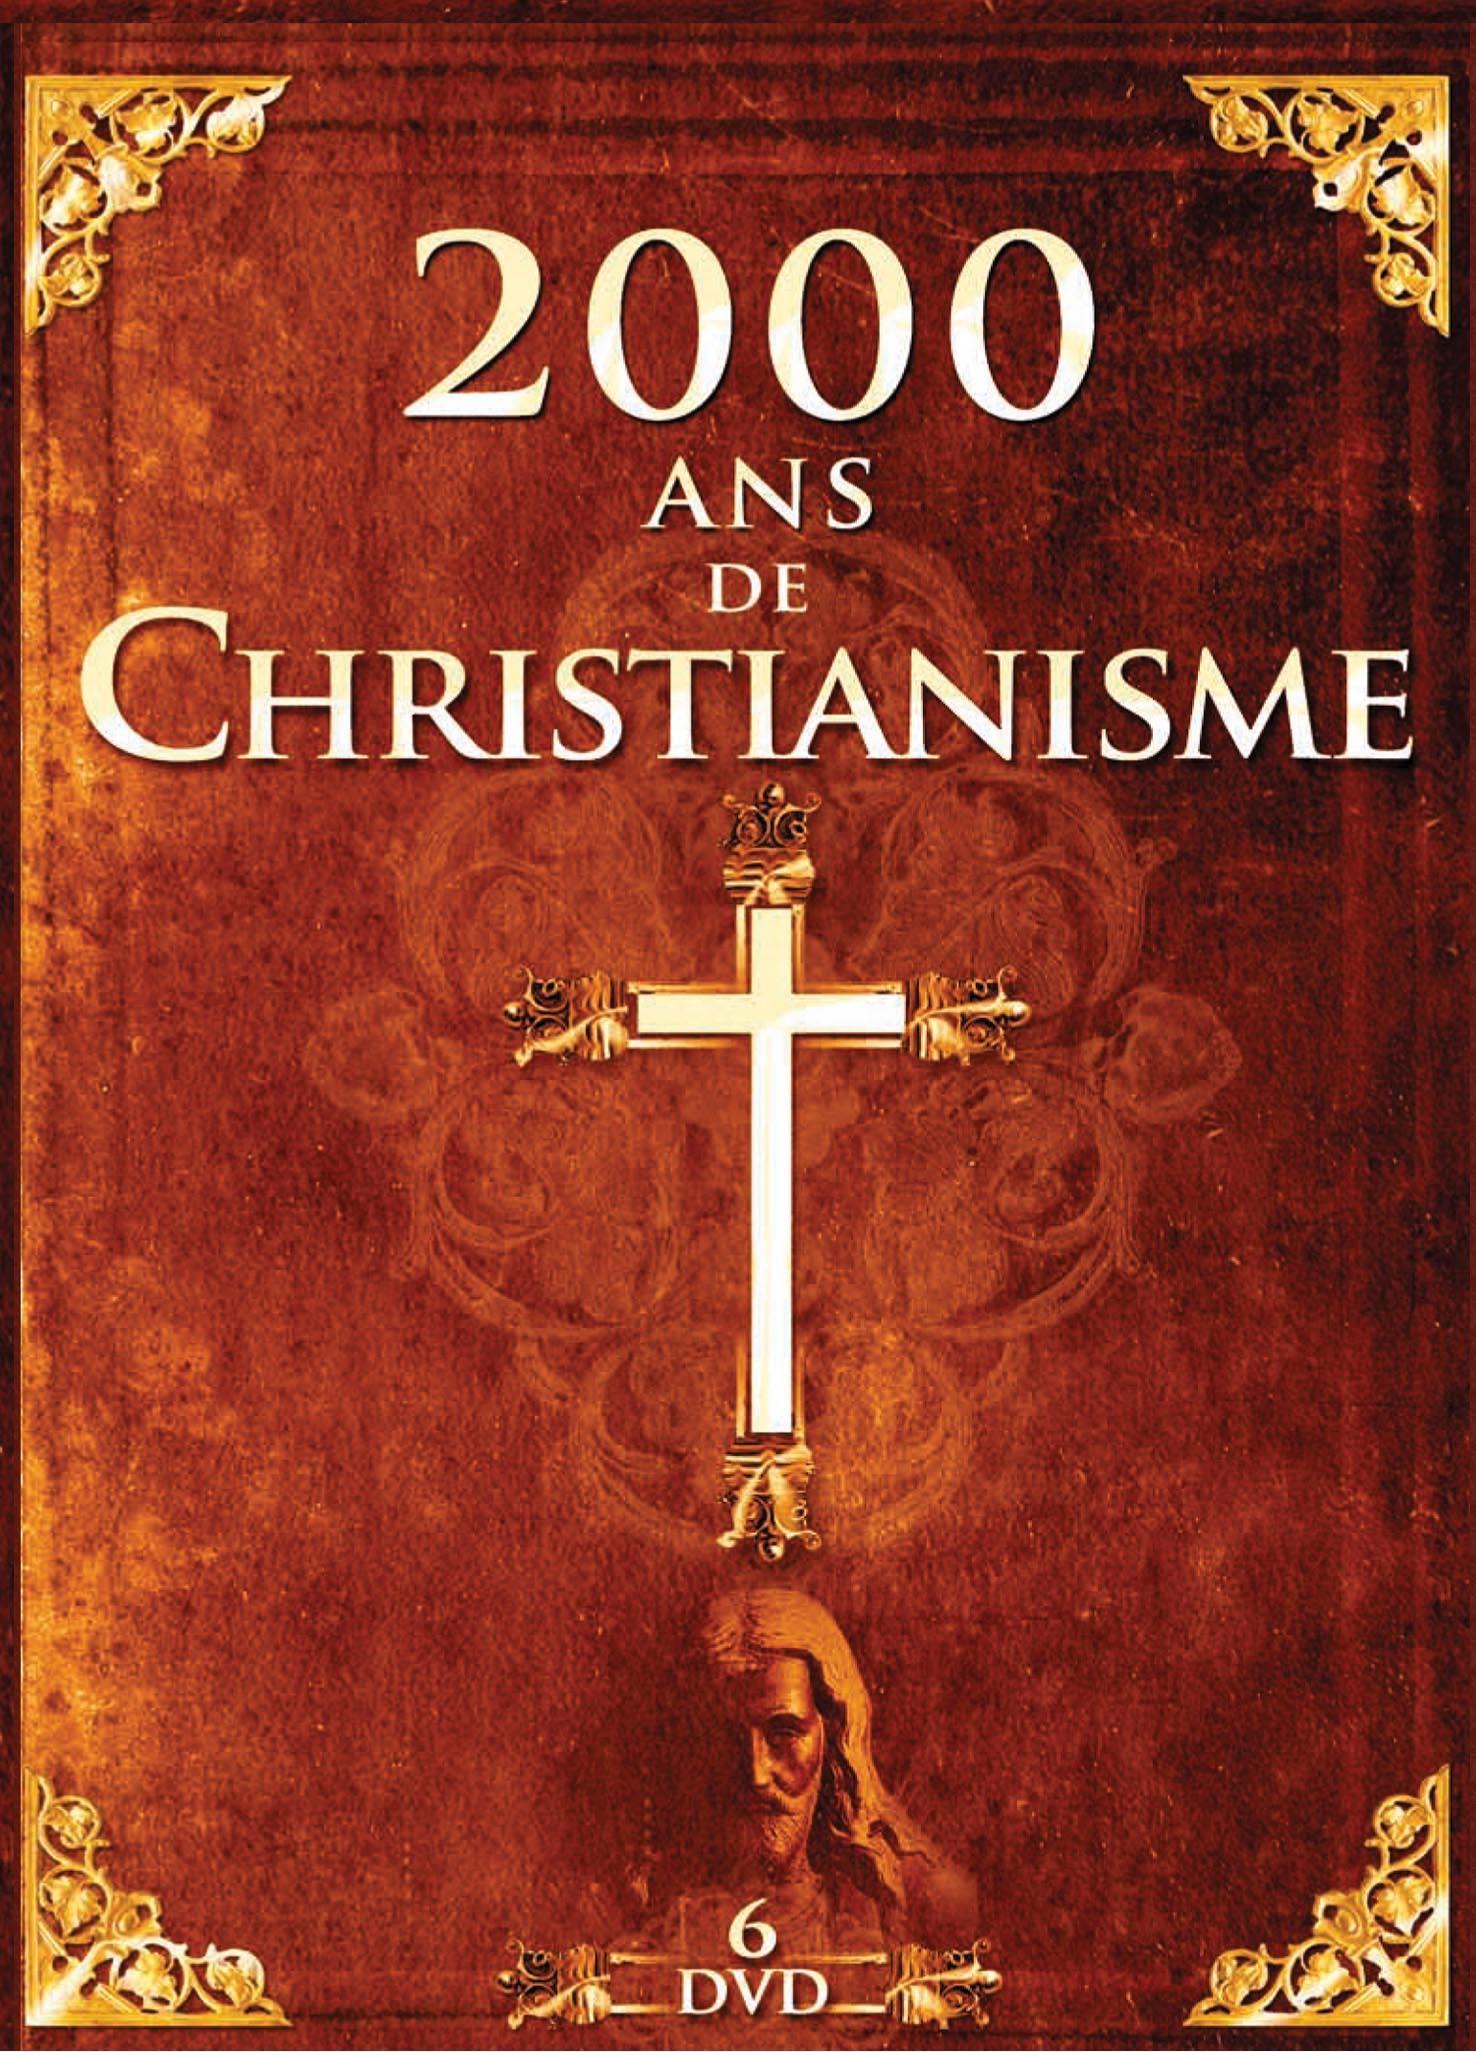 2000 ans de christianisme - 6 dvd